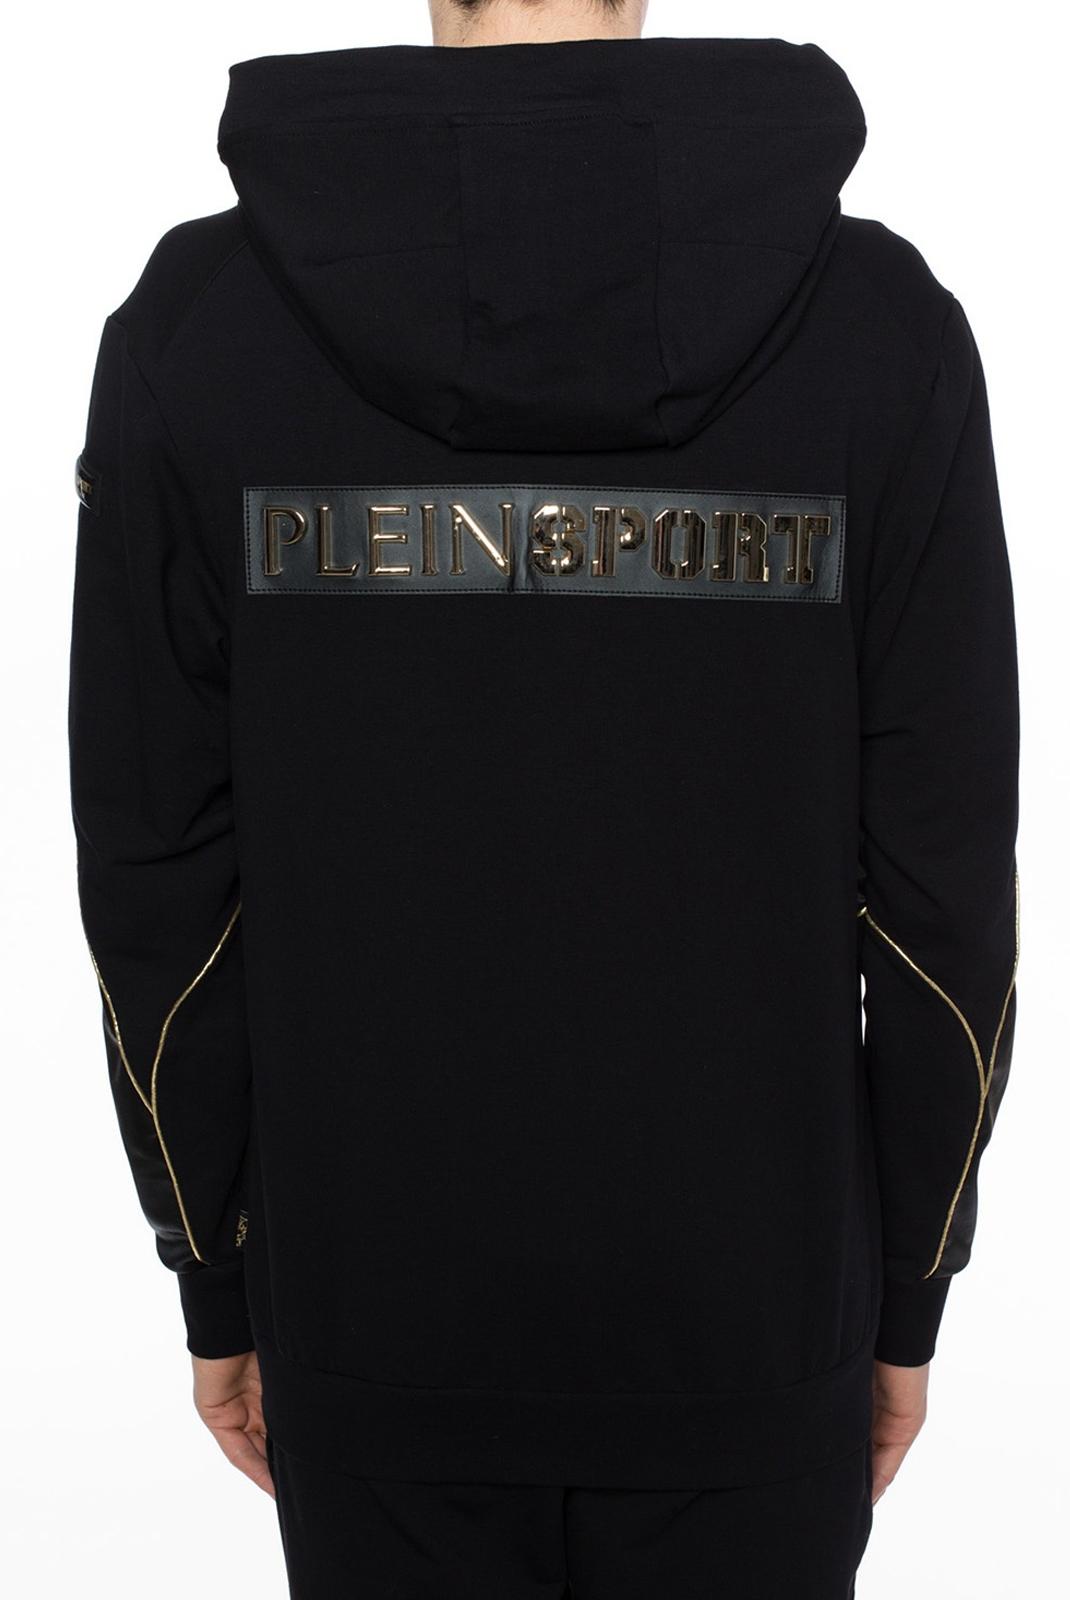 Vestes zippées  Plein Sport MJB0326 BLACK/GOLD